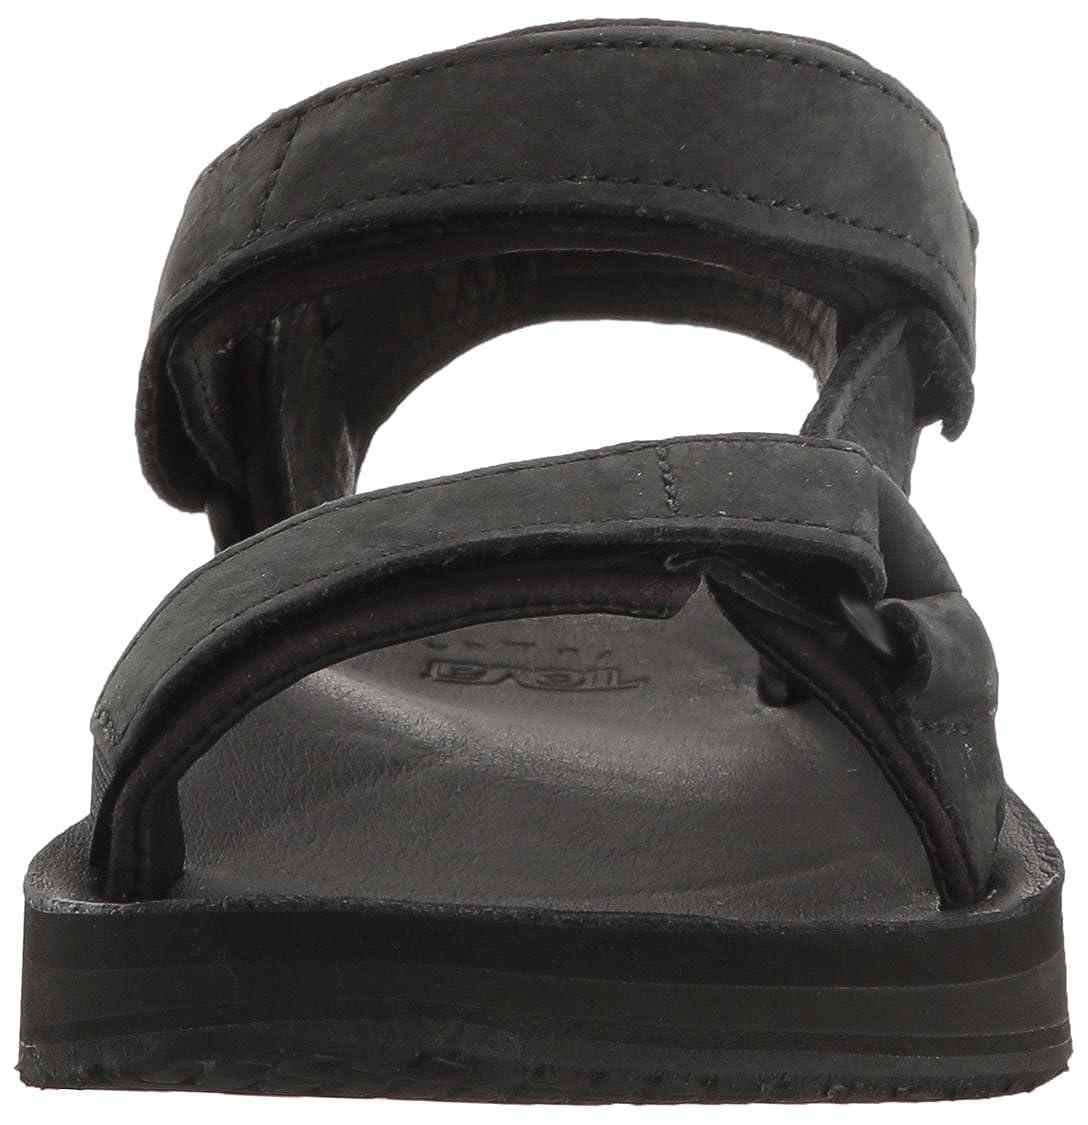 Teva Womens Women's W Original Universal Premier-Leather Sandals Sport Sandal B01MTCQHBZ Sport Sandals Premier-Leather & Slides 36e3ff